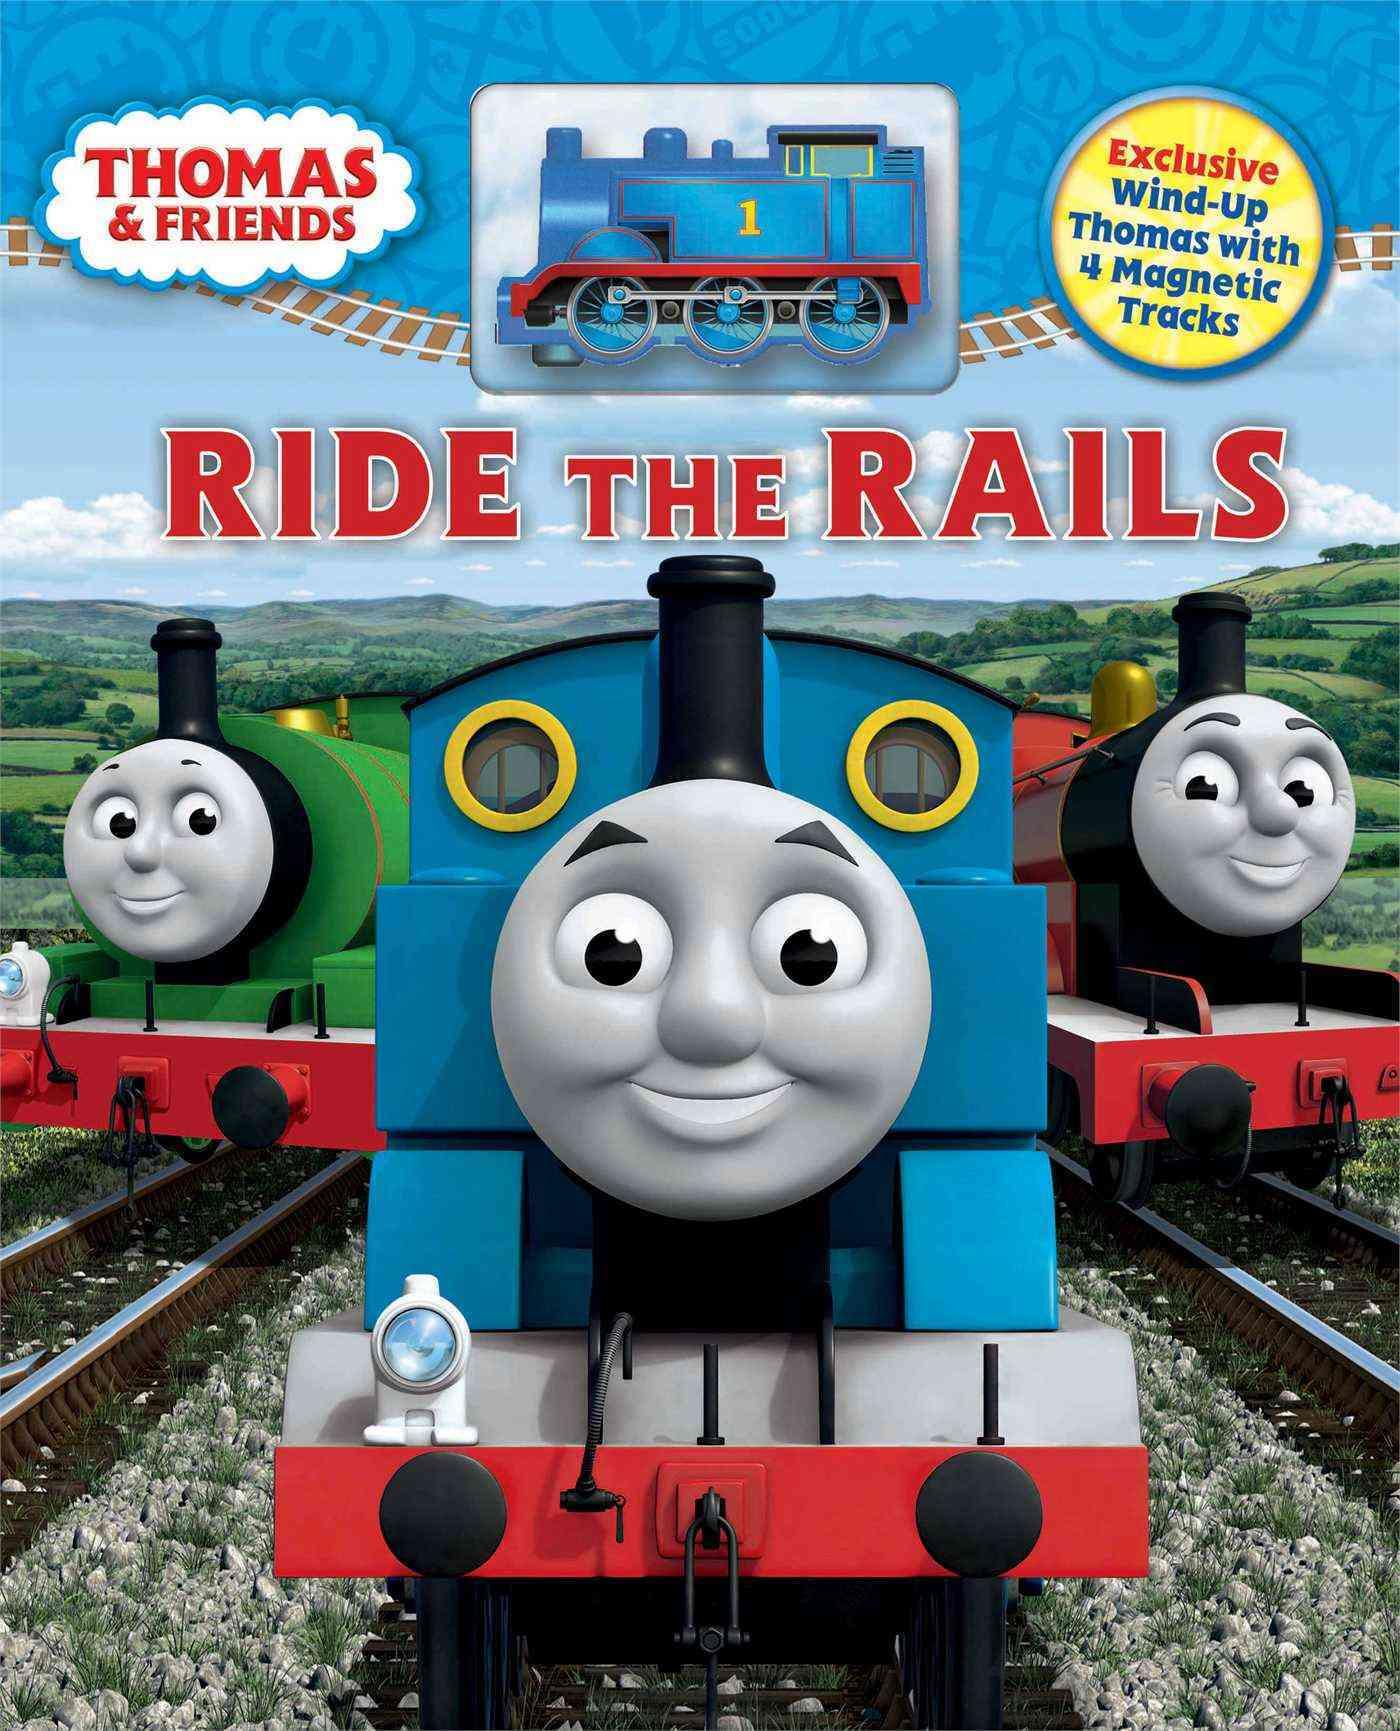 Here Comes Thomas!